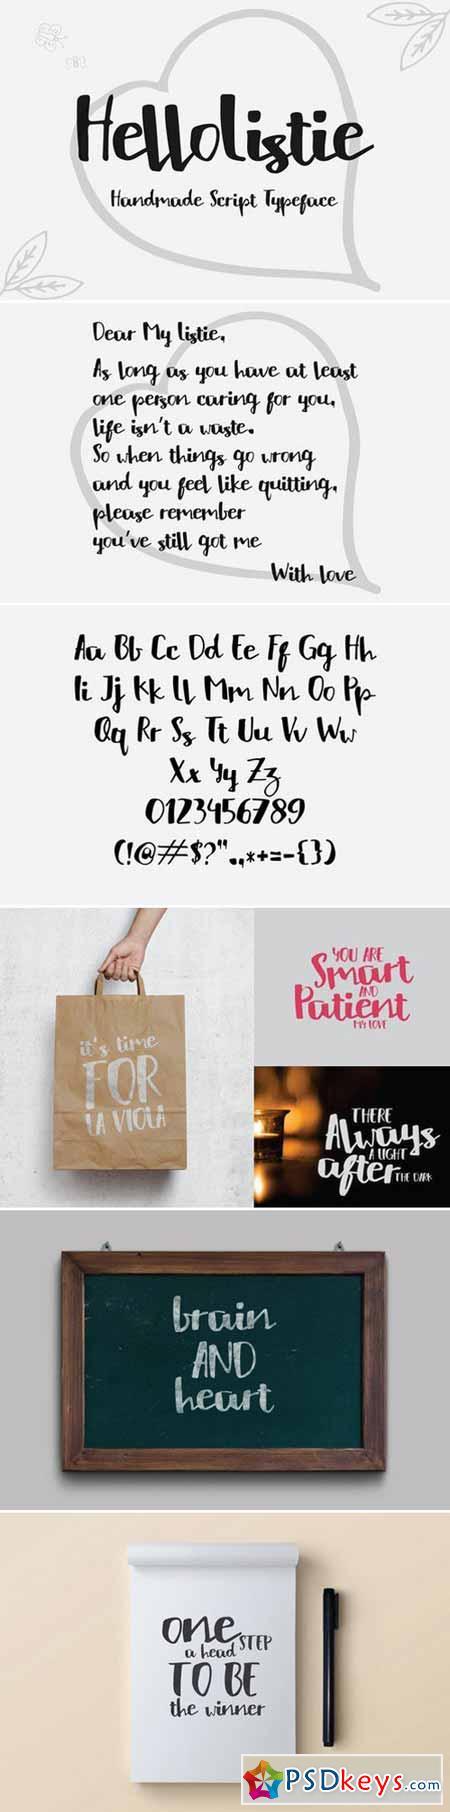 HelloListie Typeface 398384